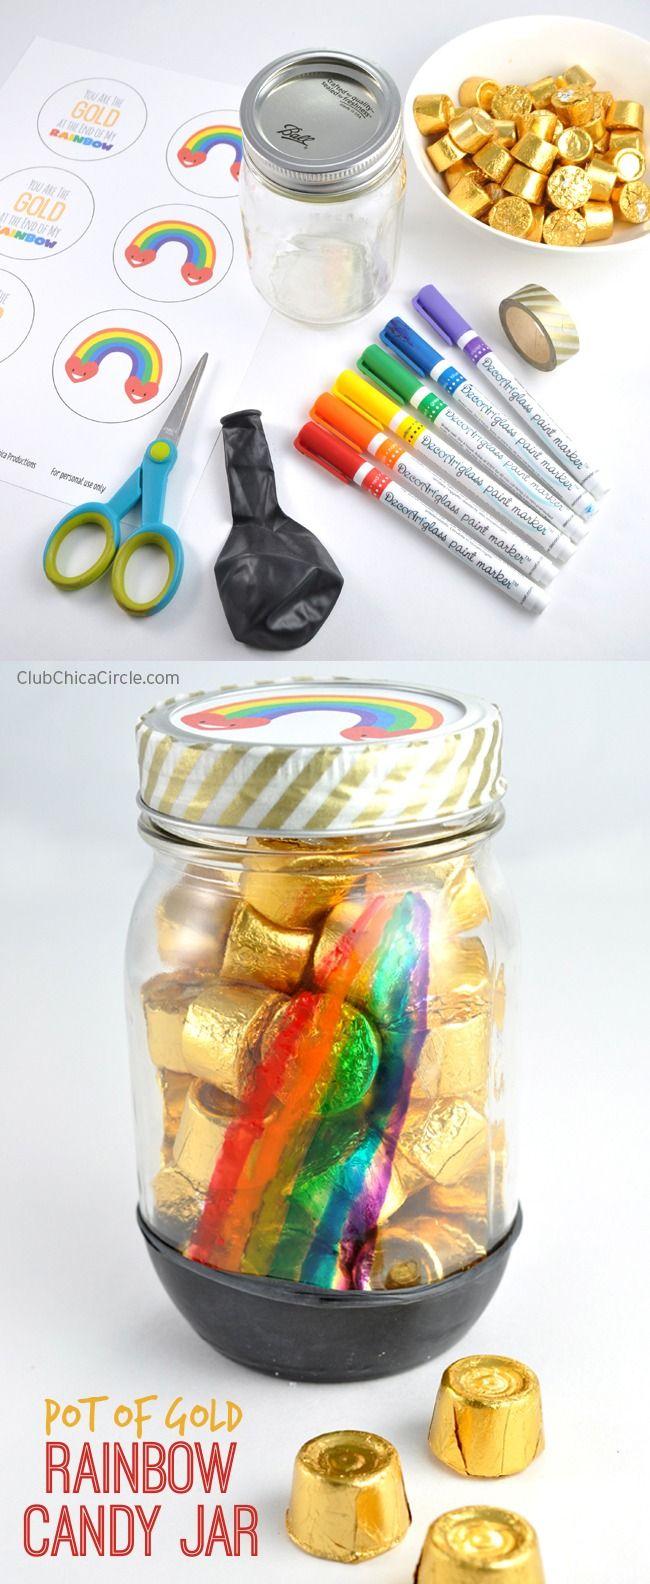 Rainbow Mason Jar St. Patrick's Day Homemade Gift Craft Idea